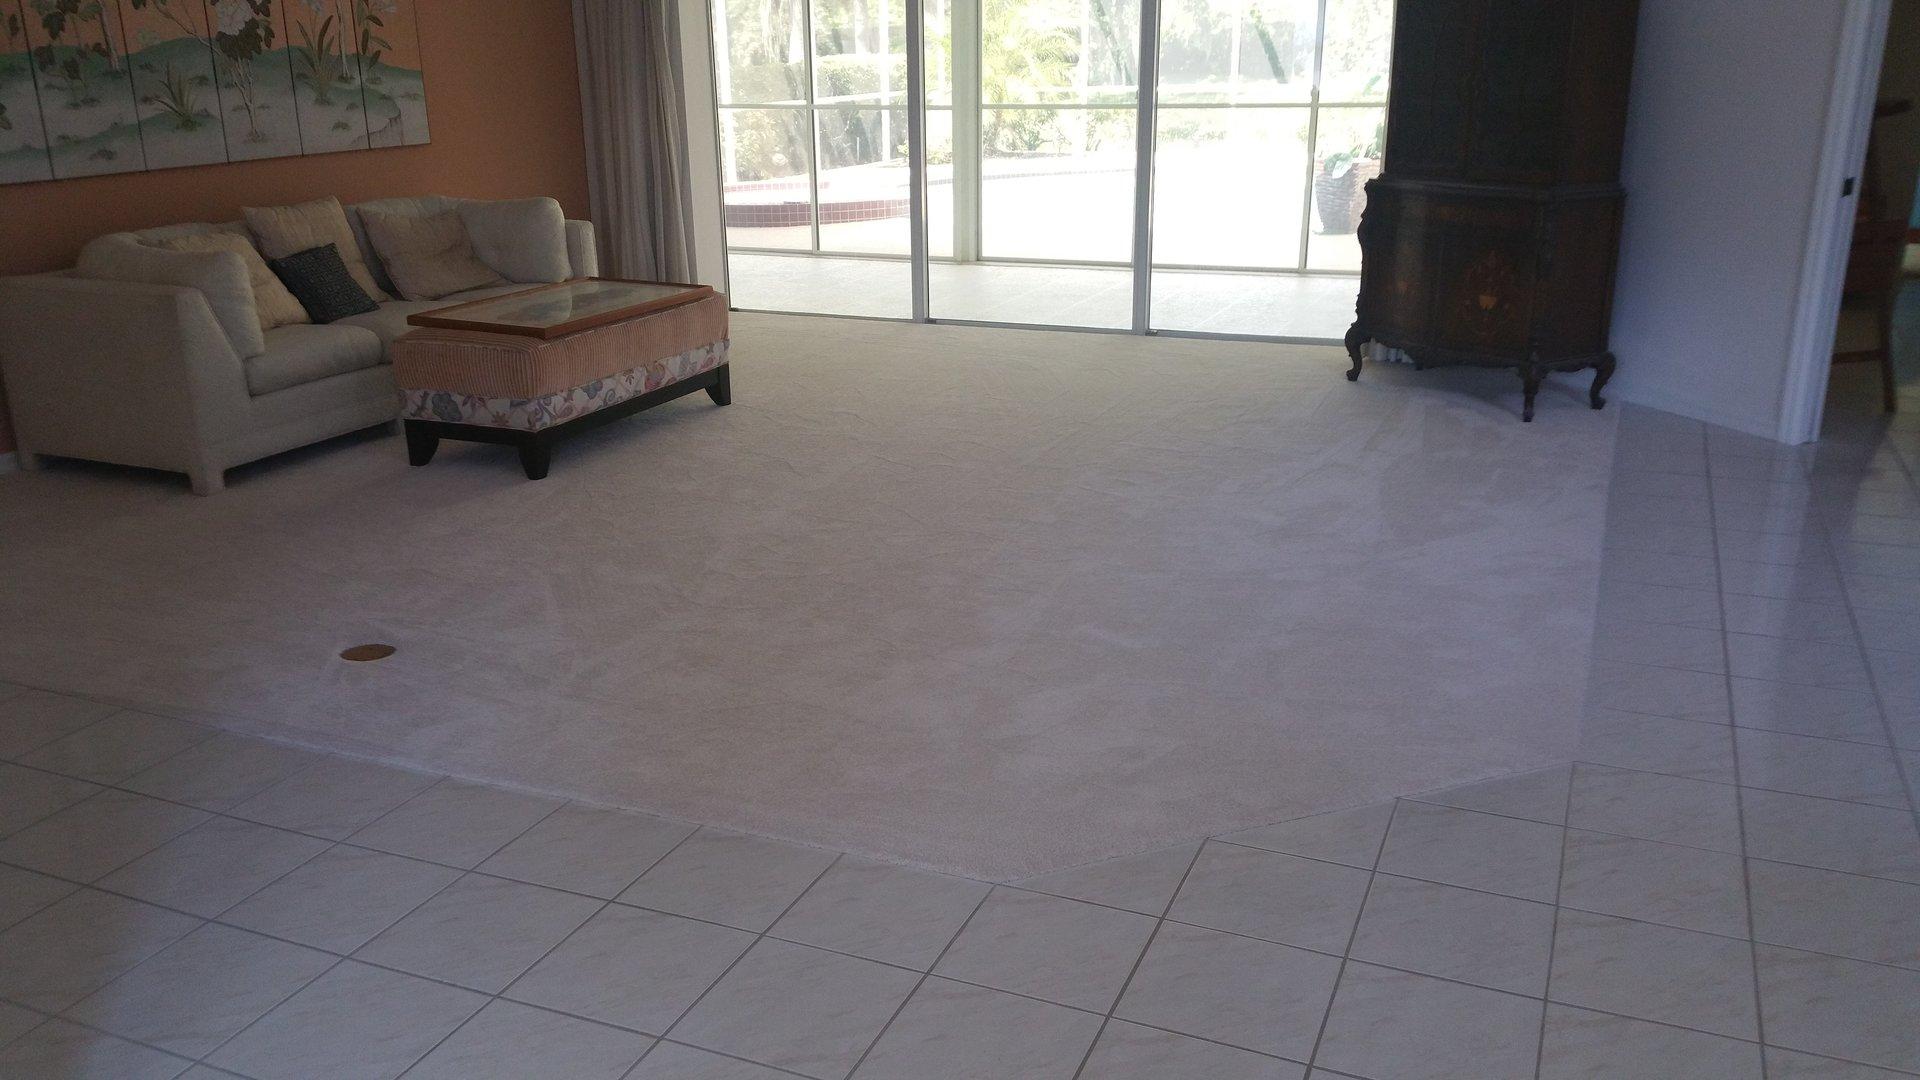 Carpets residential carpets sarasota fl carpet inset dailygadgetfo Image collections